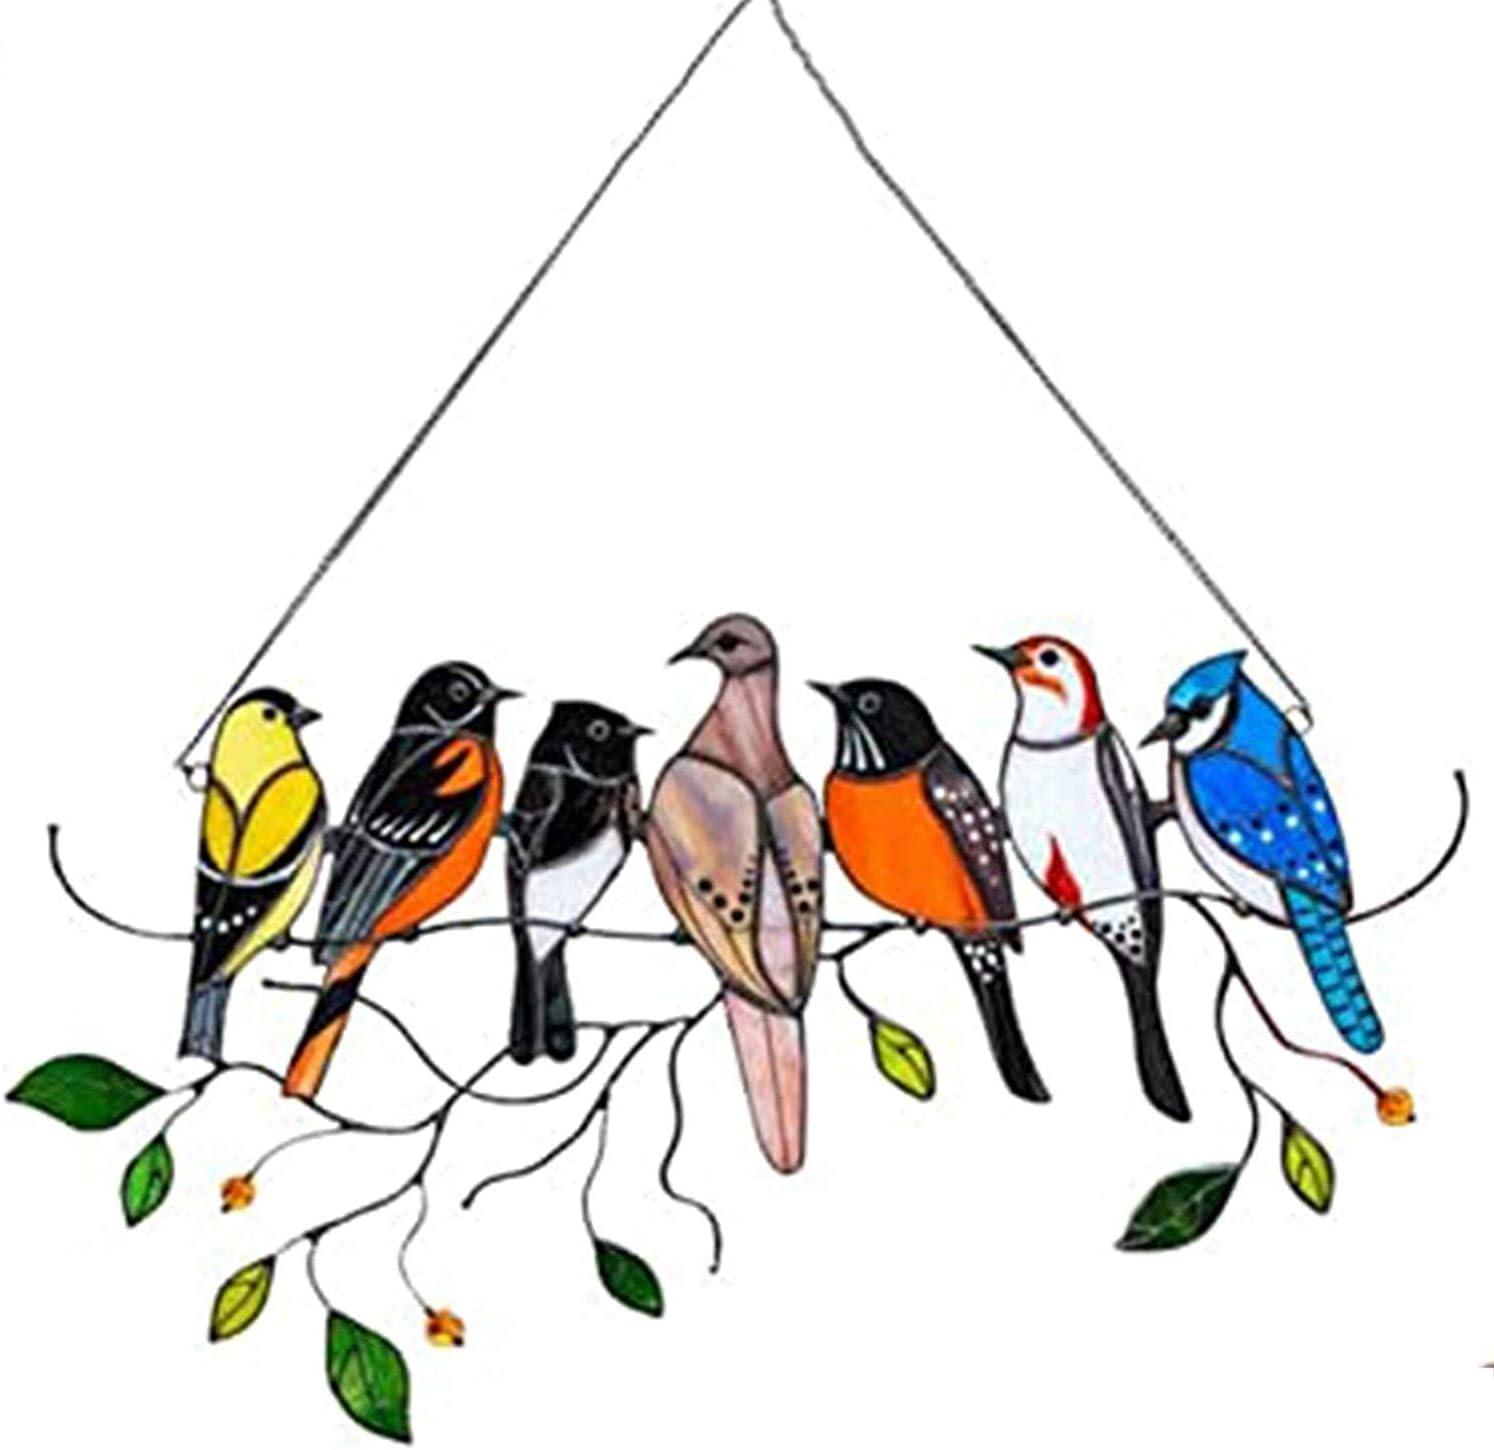 Multicolor Birds on a Wire Plastic Bird Suncatcher Window Hanging, Bird Series Ornaments Pendant for Windows Doors Room Home Decoration, Acrylic Birds Gifts for Bird Lover (A)